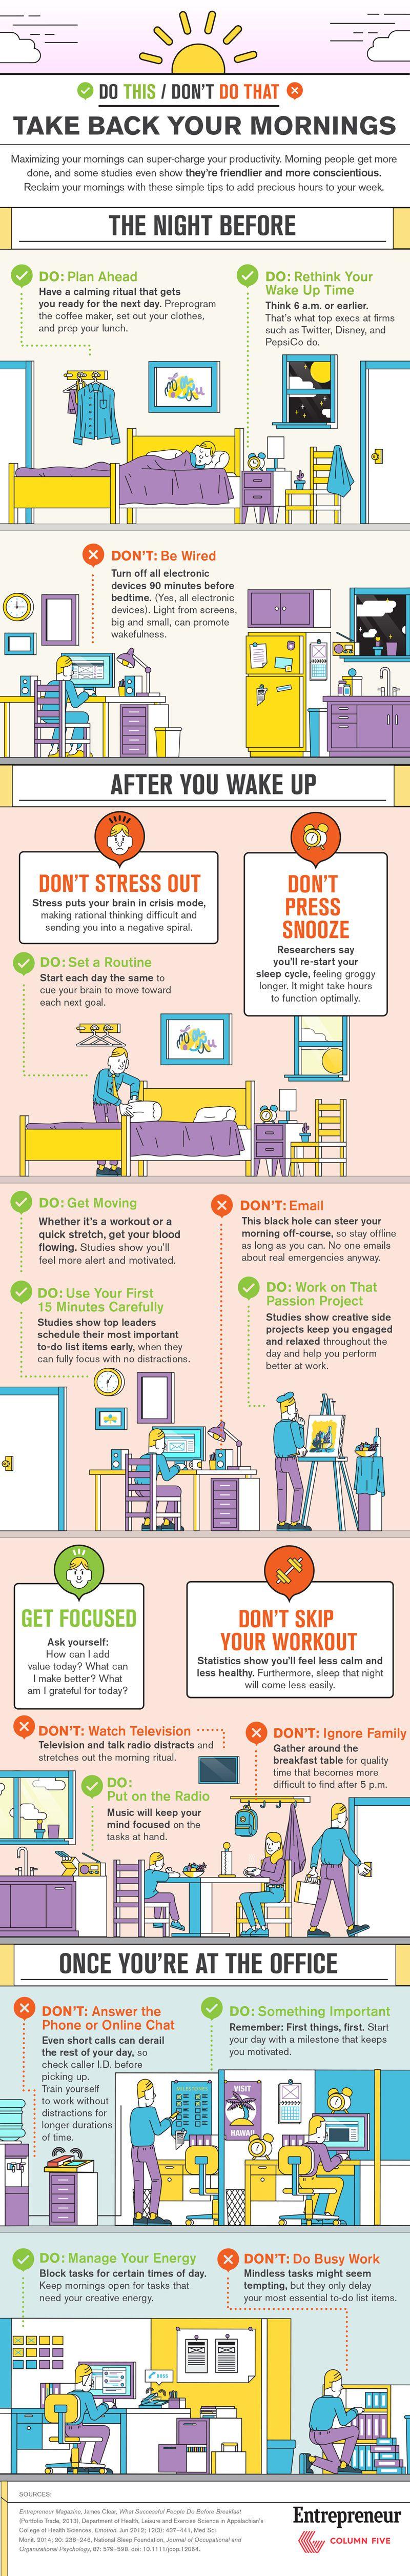 Httpssmediacacheakpinimgcomoriginalsddb - 10 of the most successful entrepreneurs reveal their secret morning rituals